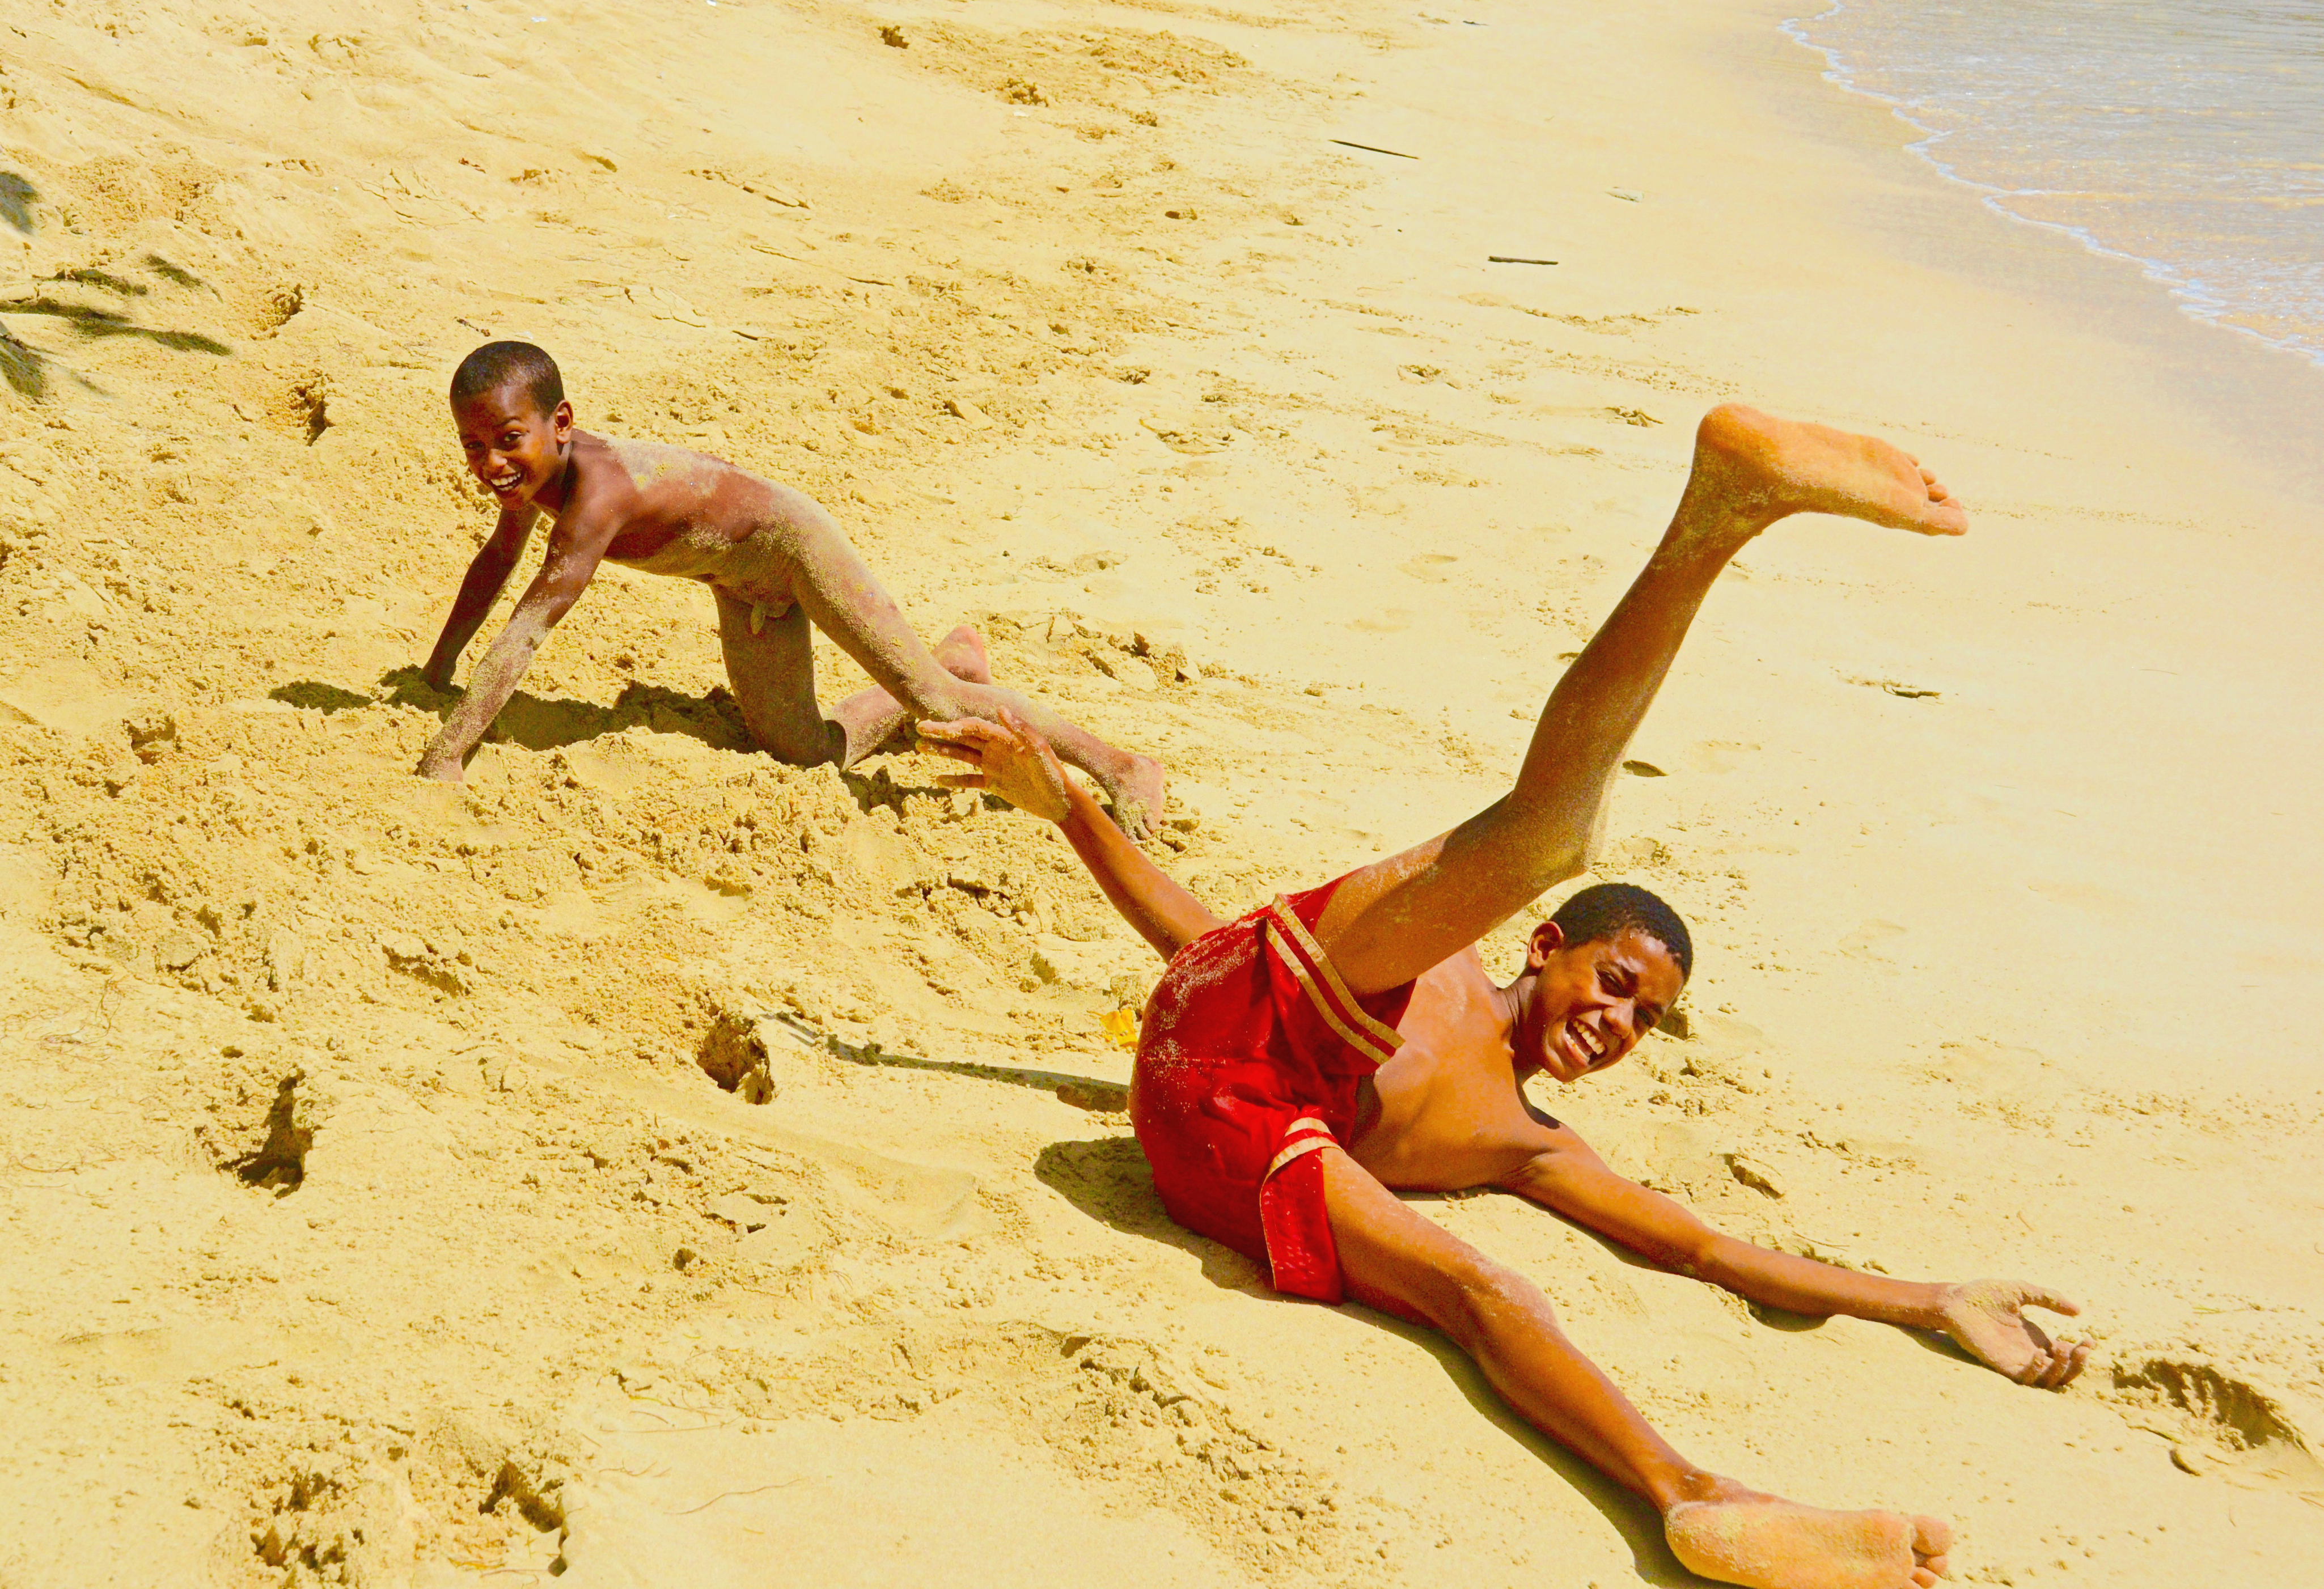 Dominican beach boys frolick fix